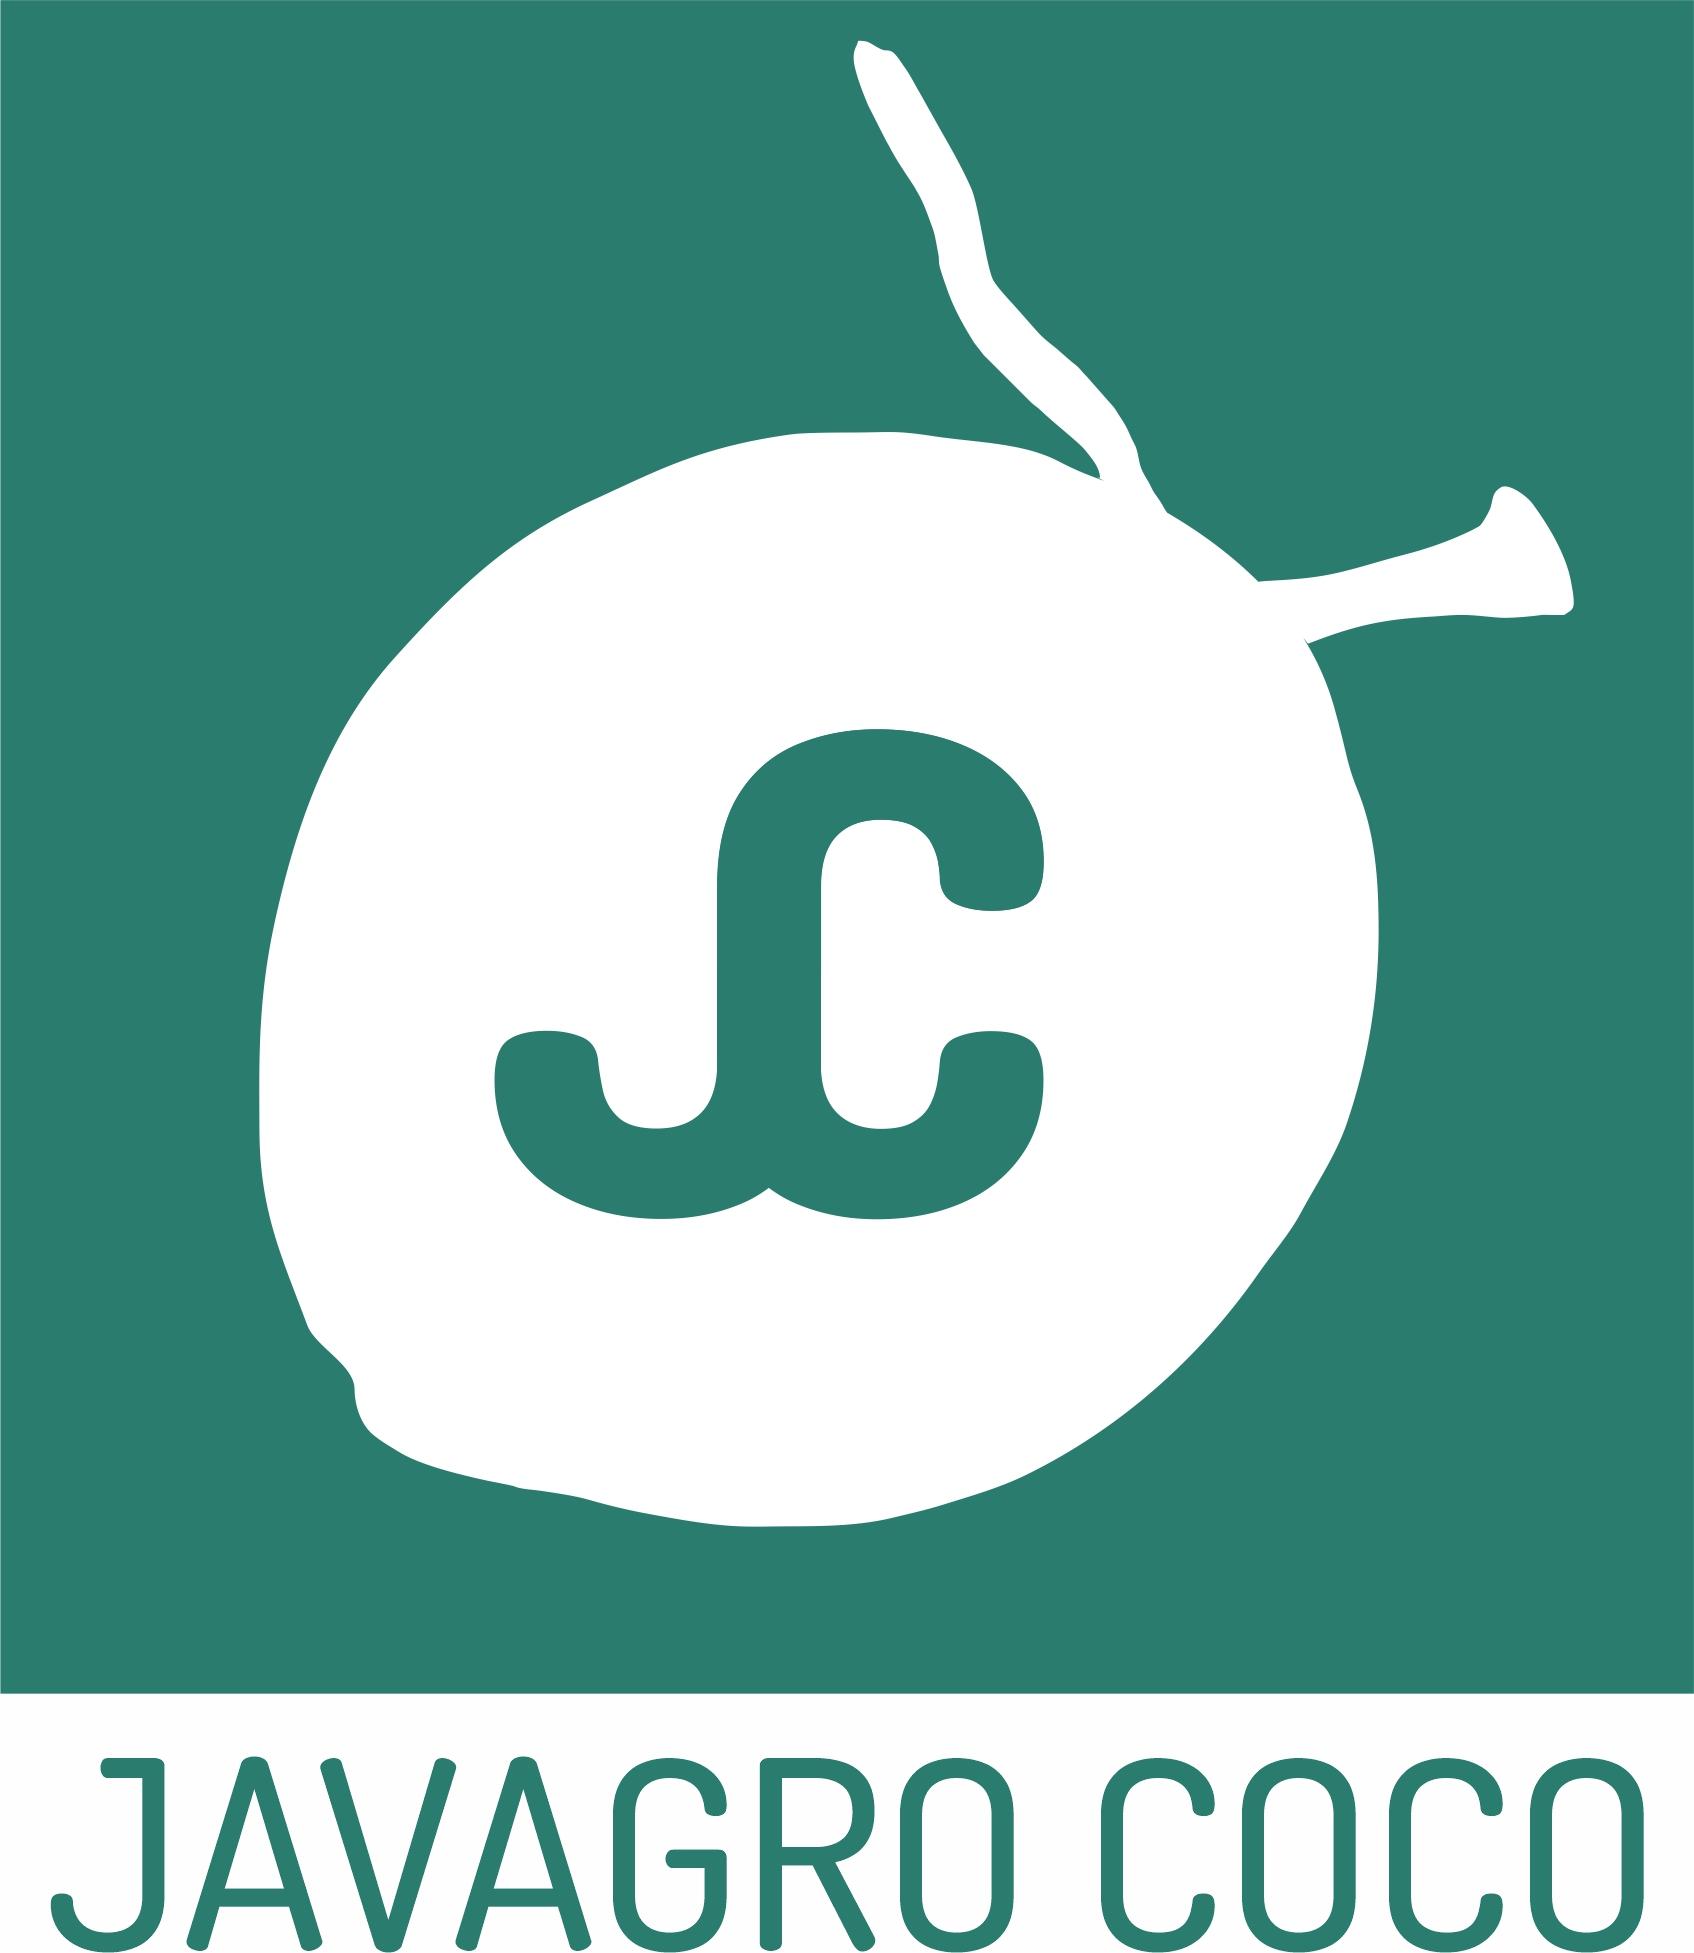 JAVAGRO COCO